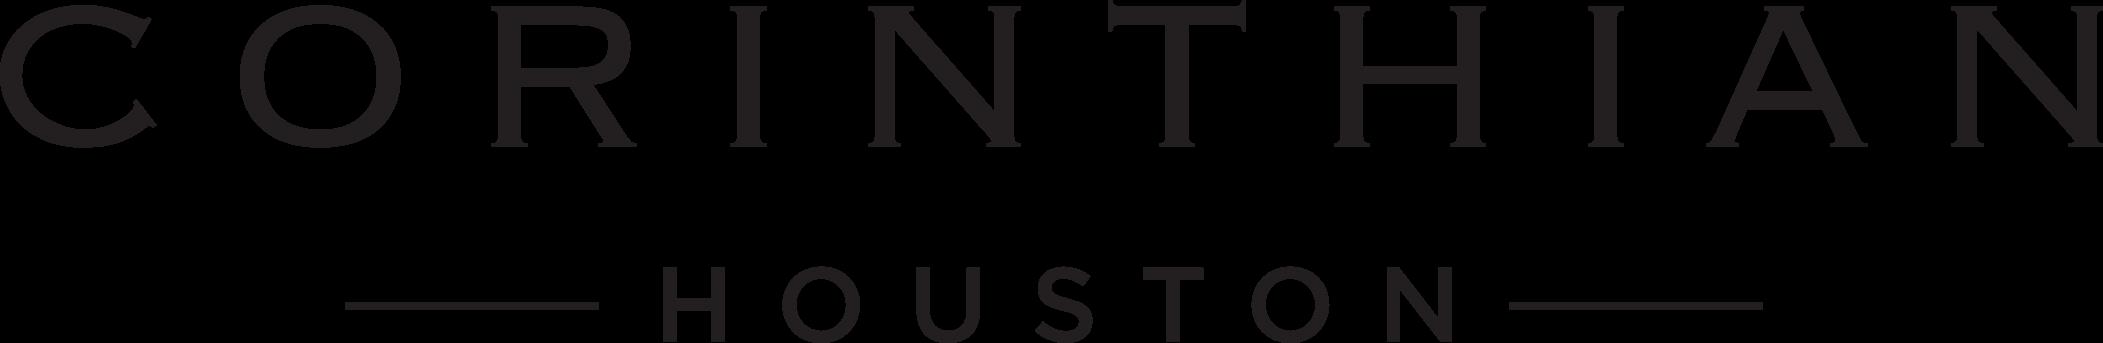 Corinthian Houston